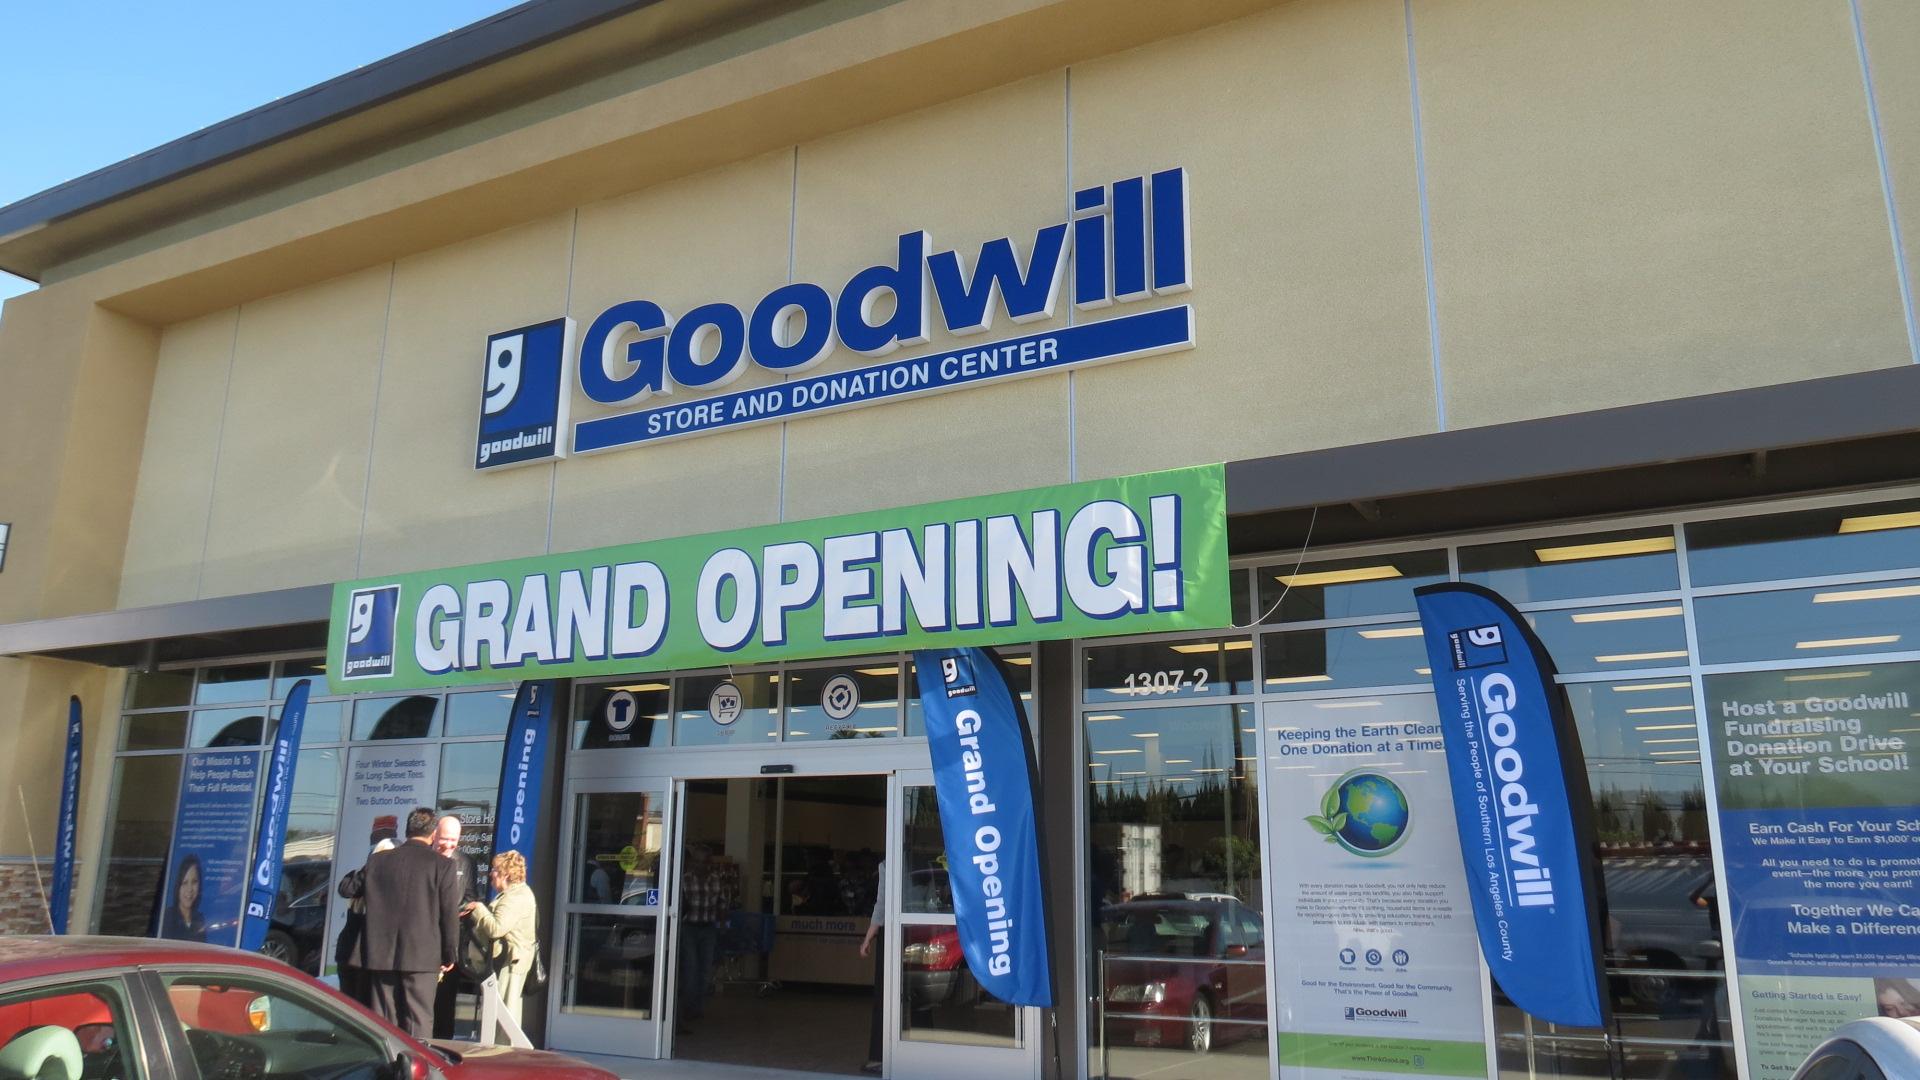 Torrance Goodwill Retail Store & Donation Center